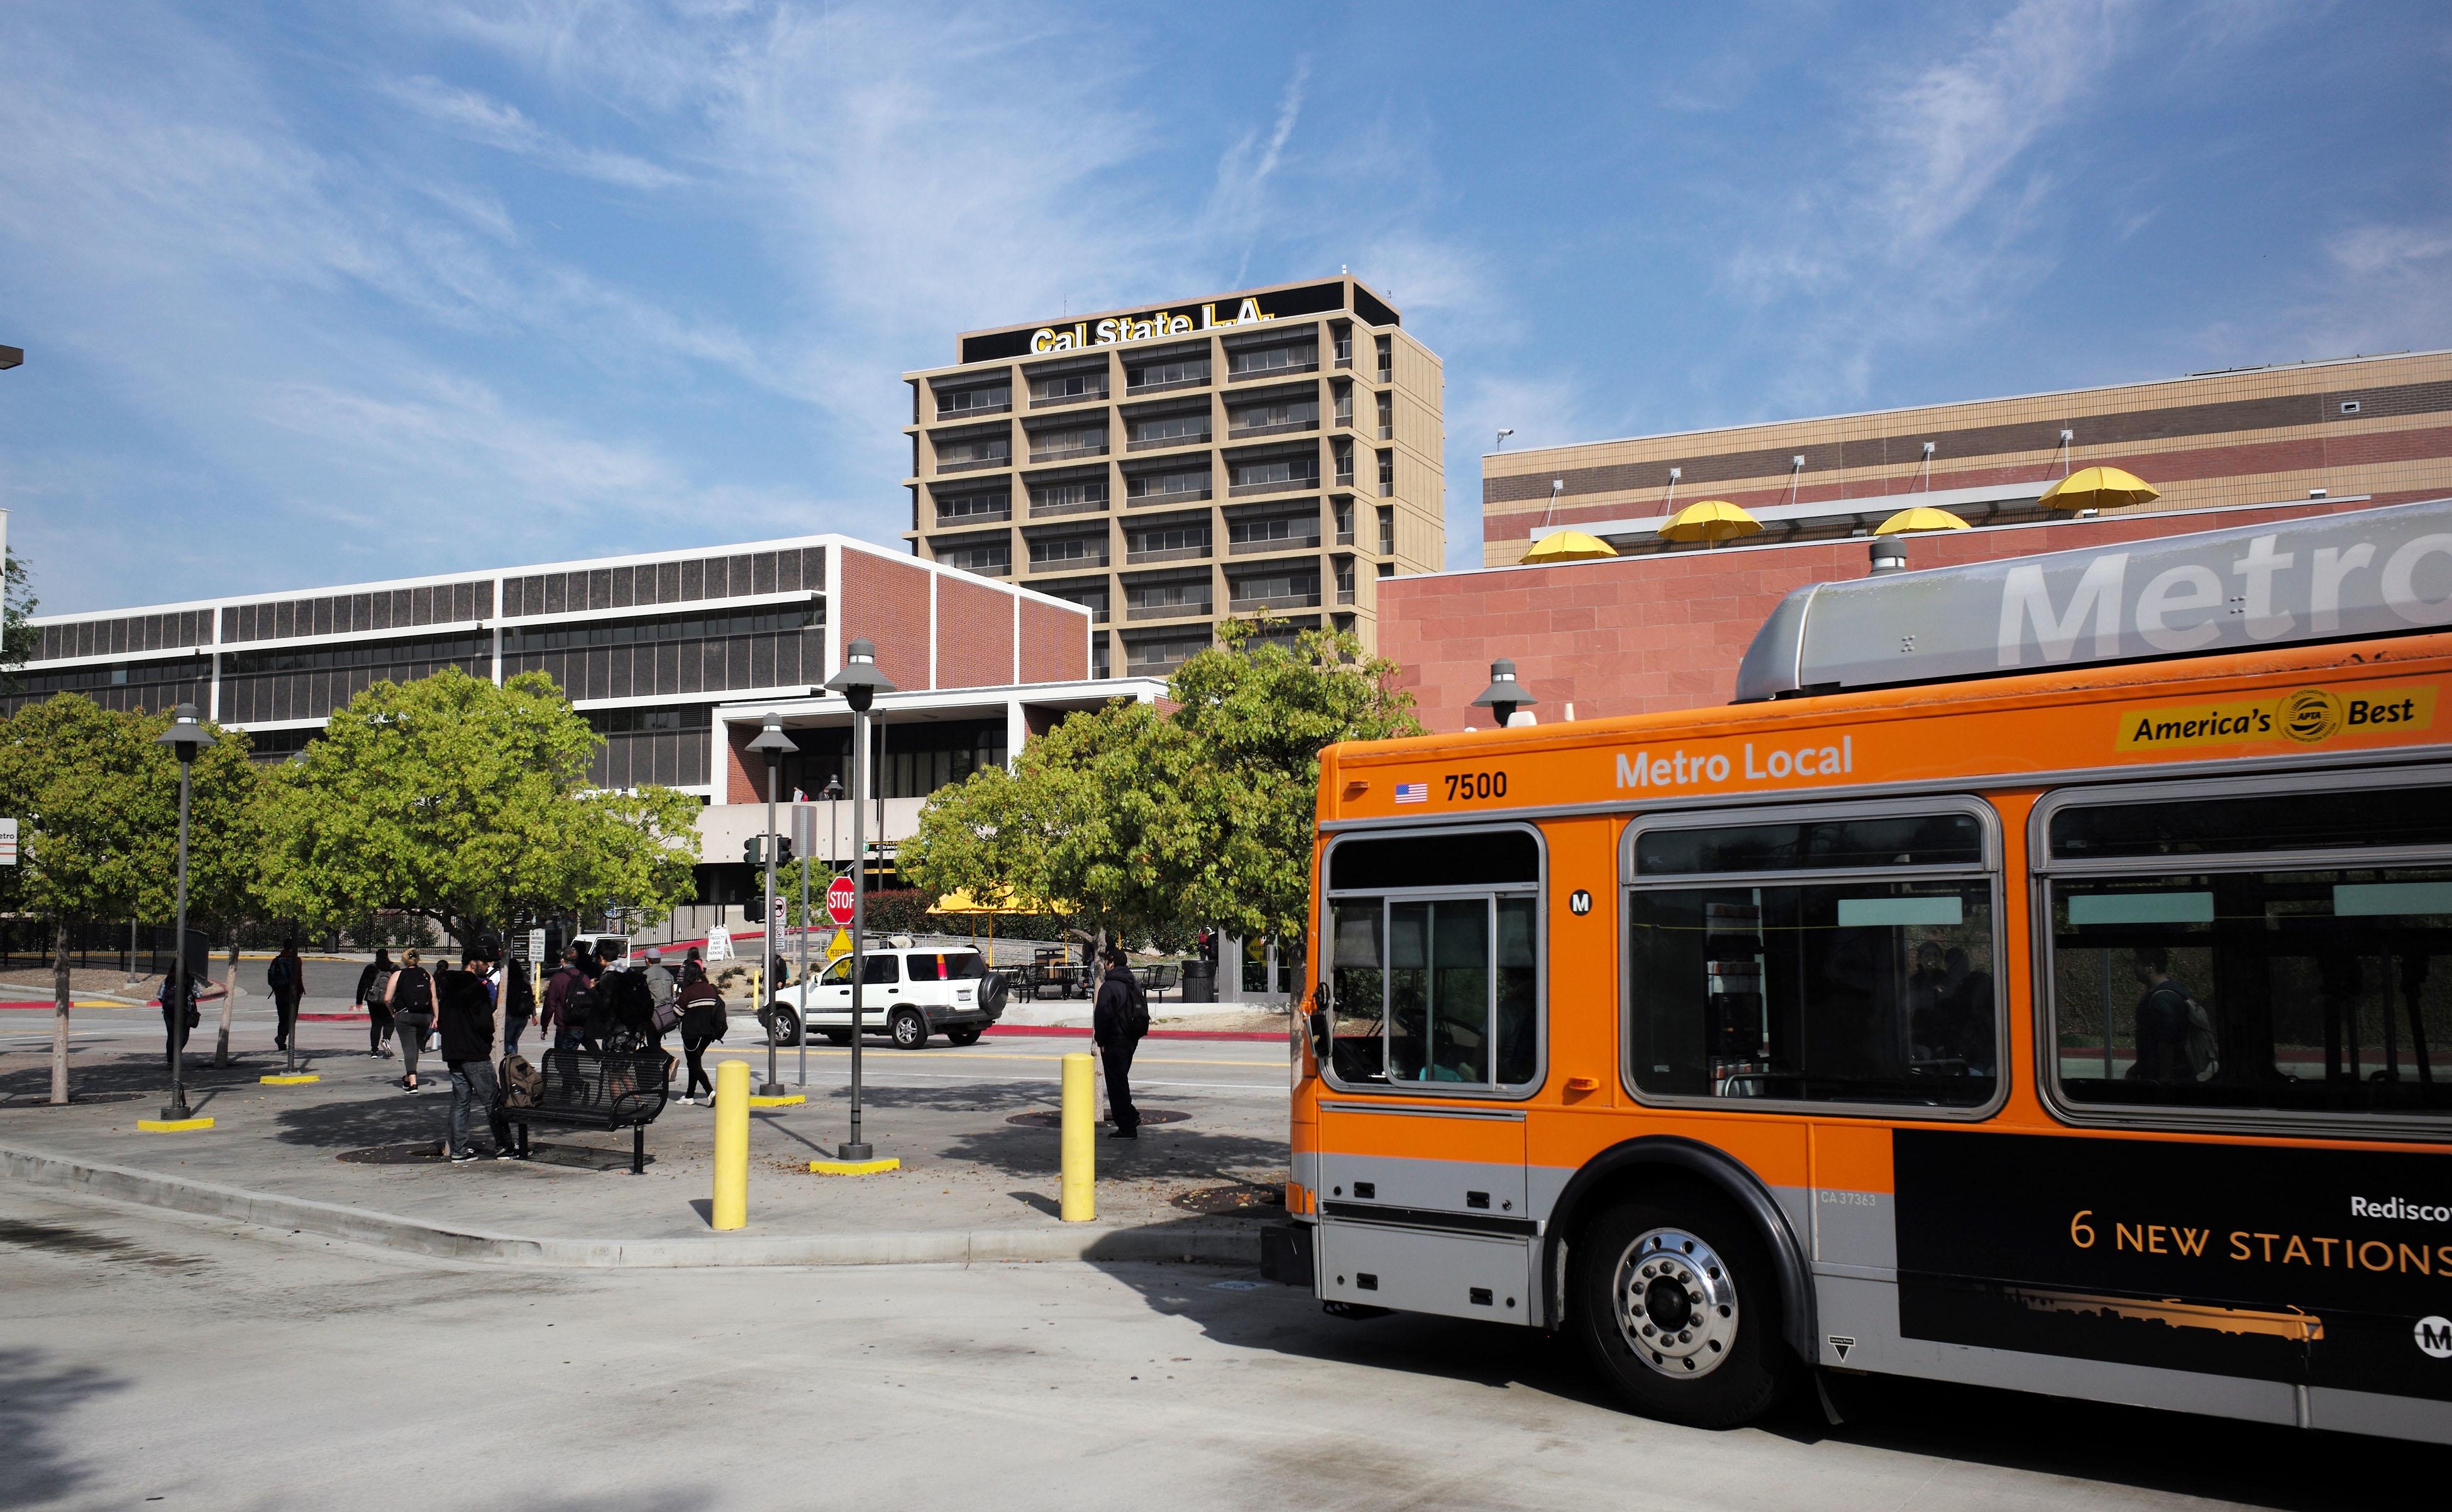 Cal State LA Transit Center